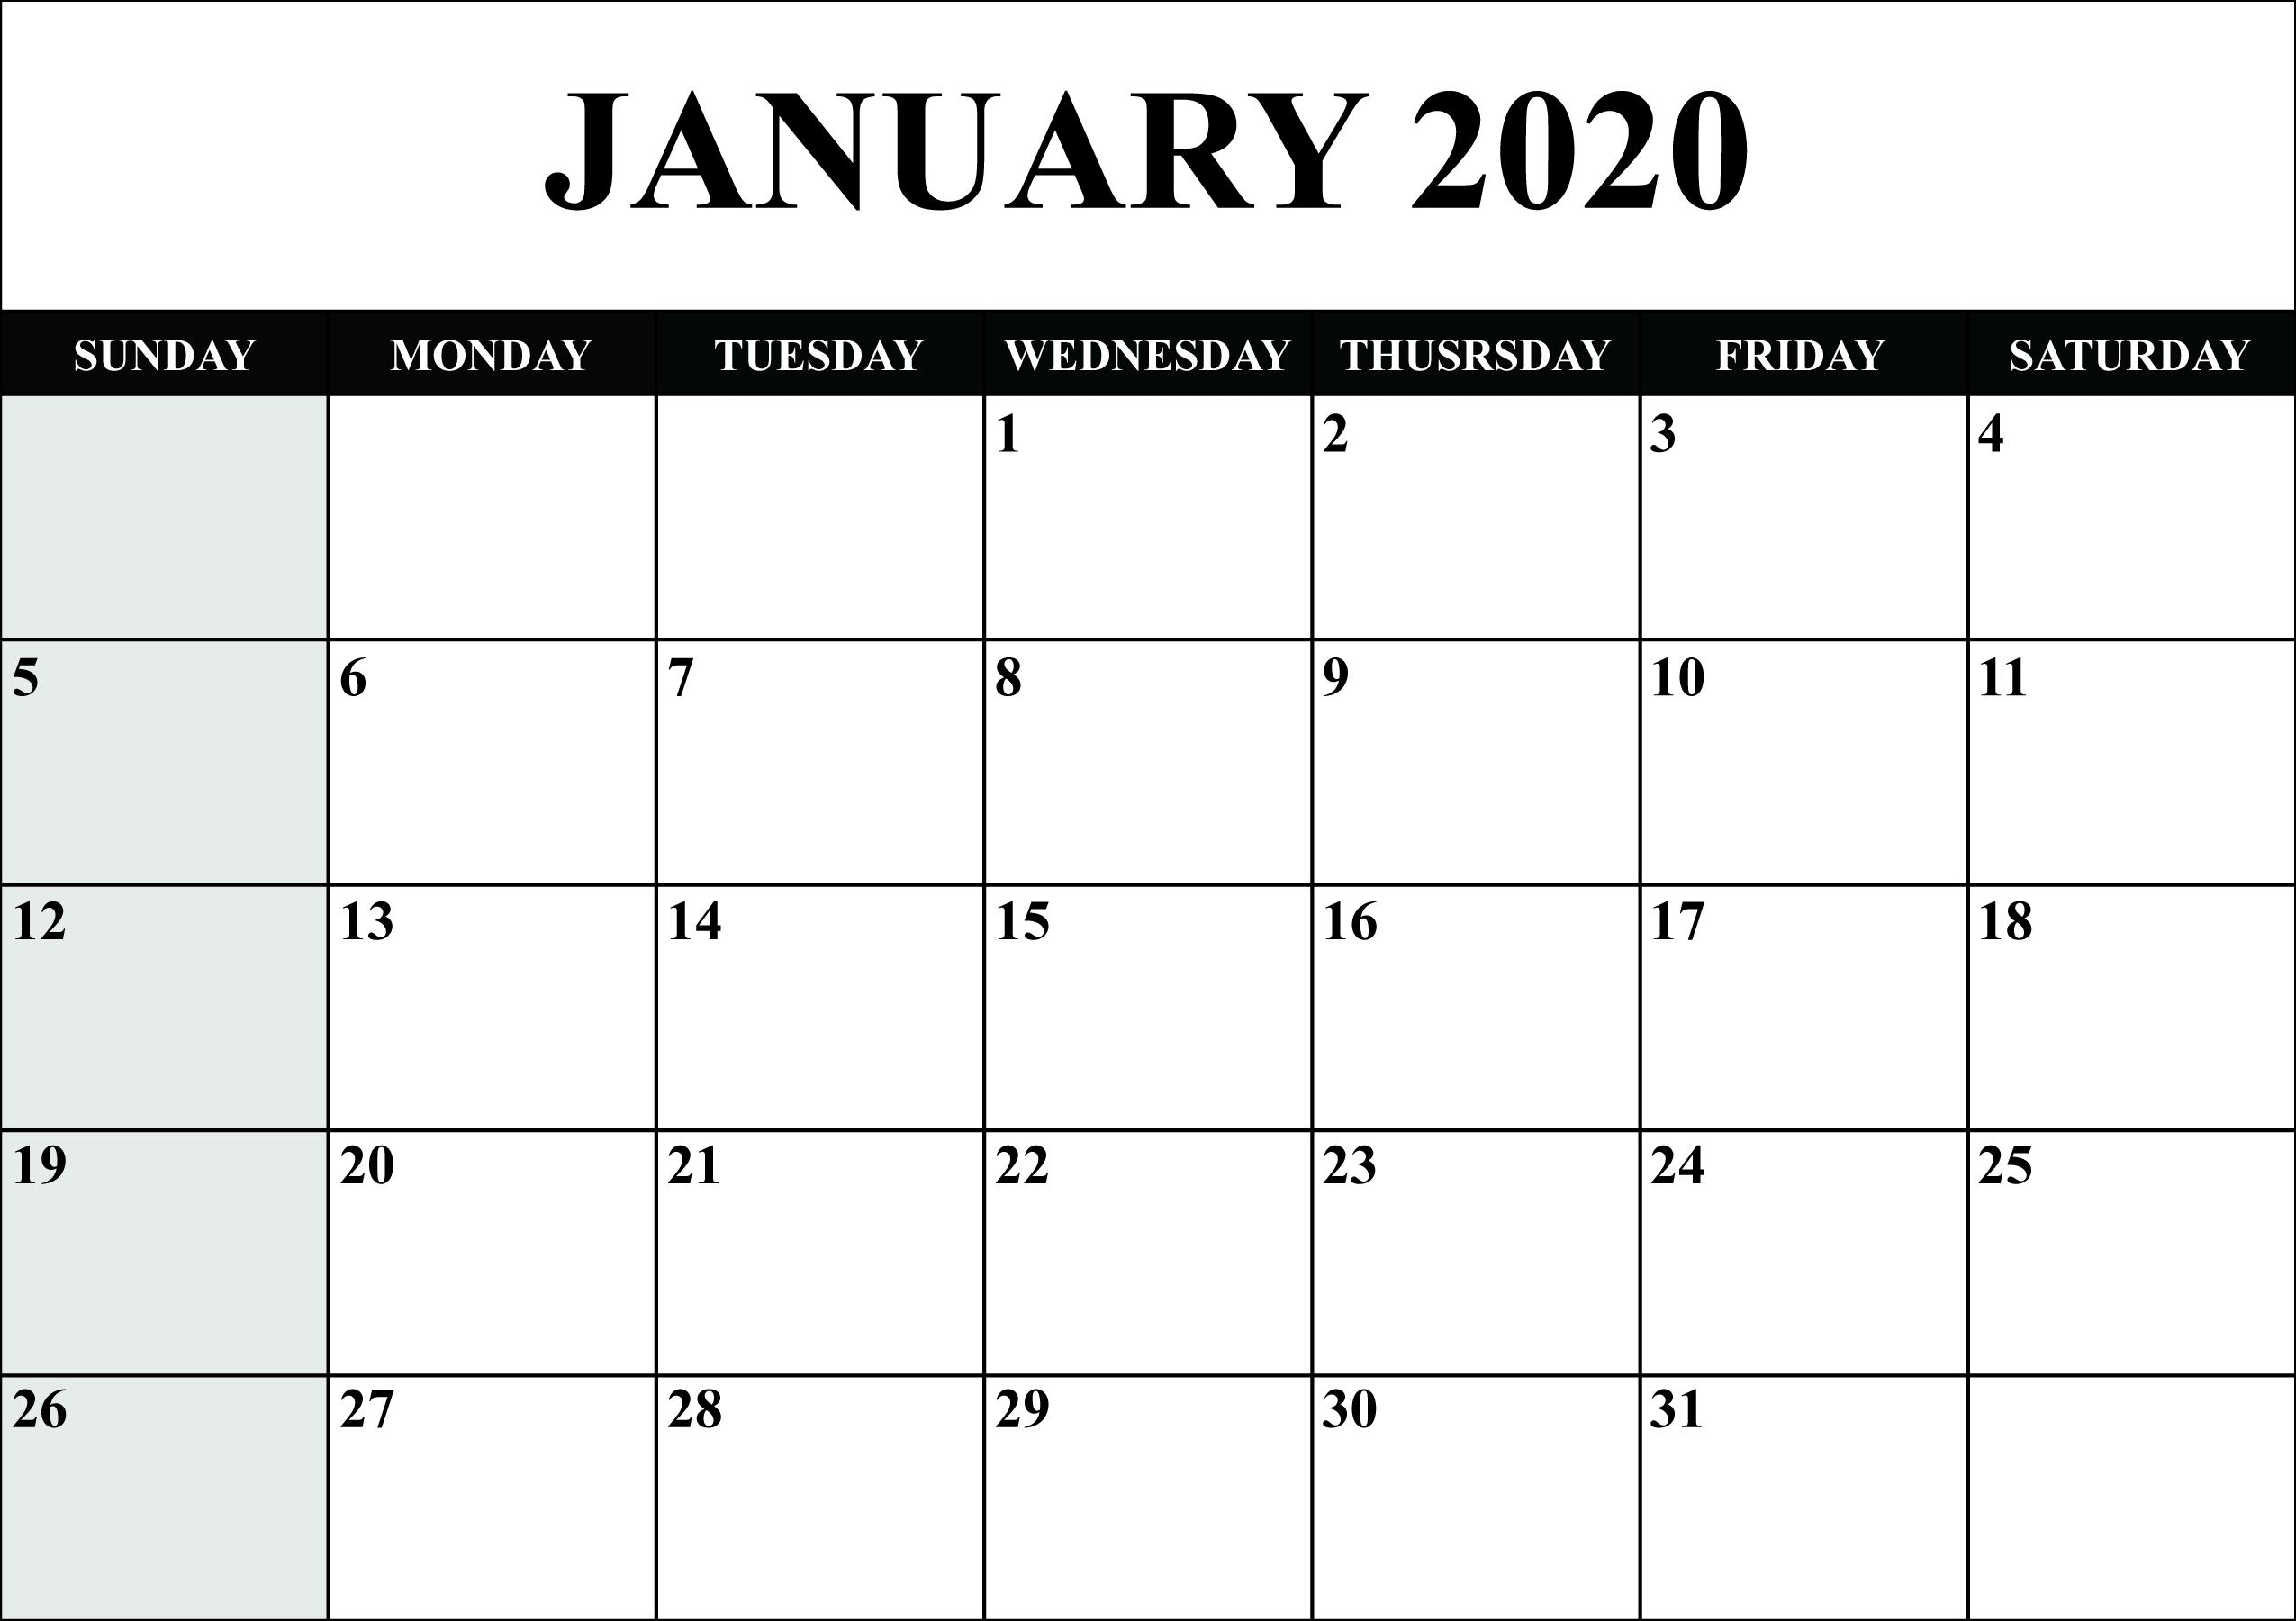 Free Blank January 2020 Calendar Printable In Pdf, Word-January 2020 Calendar Template Word